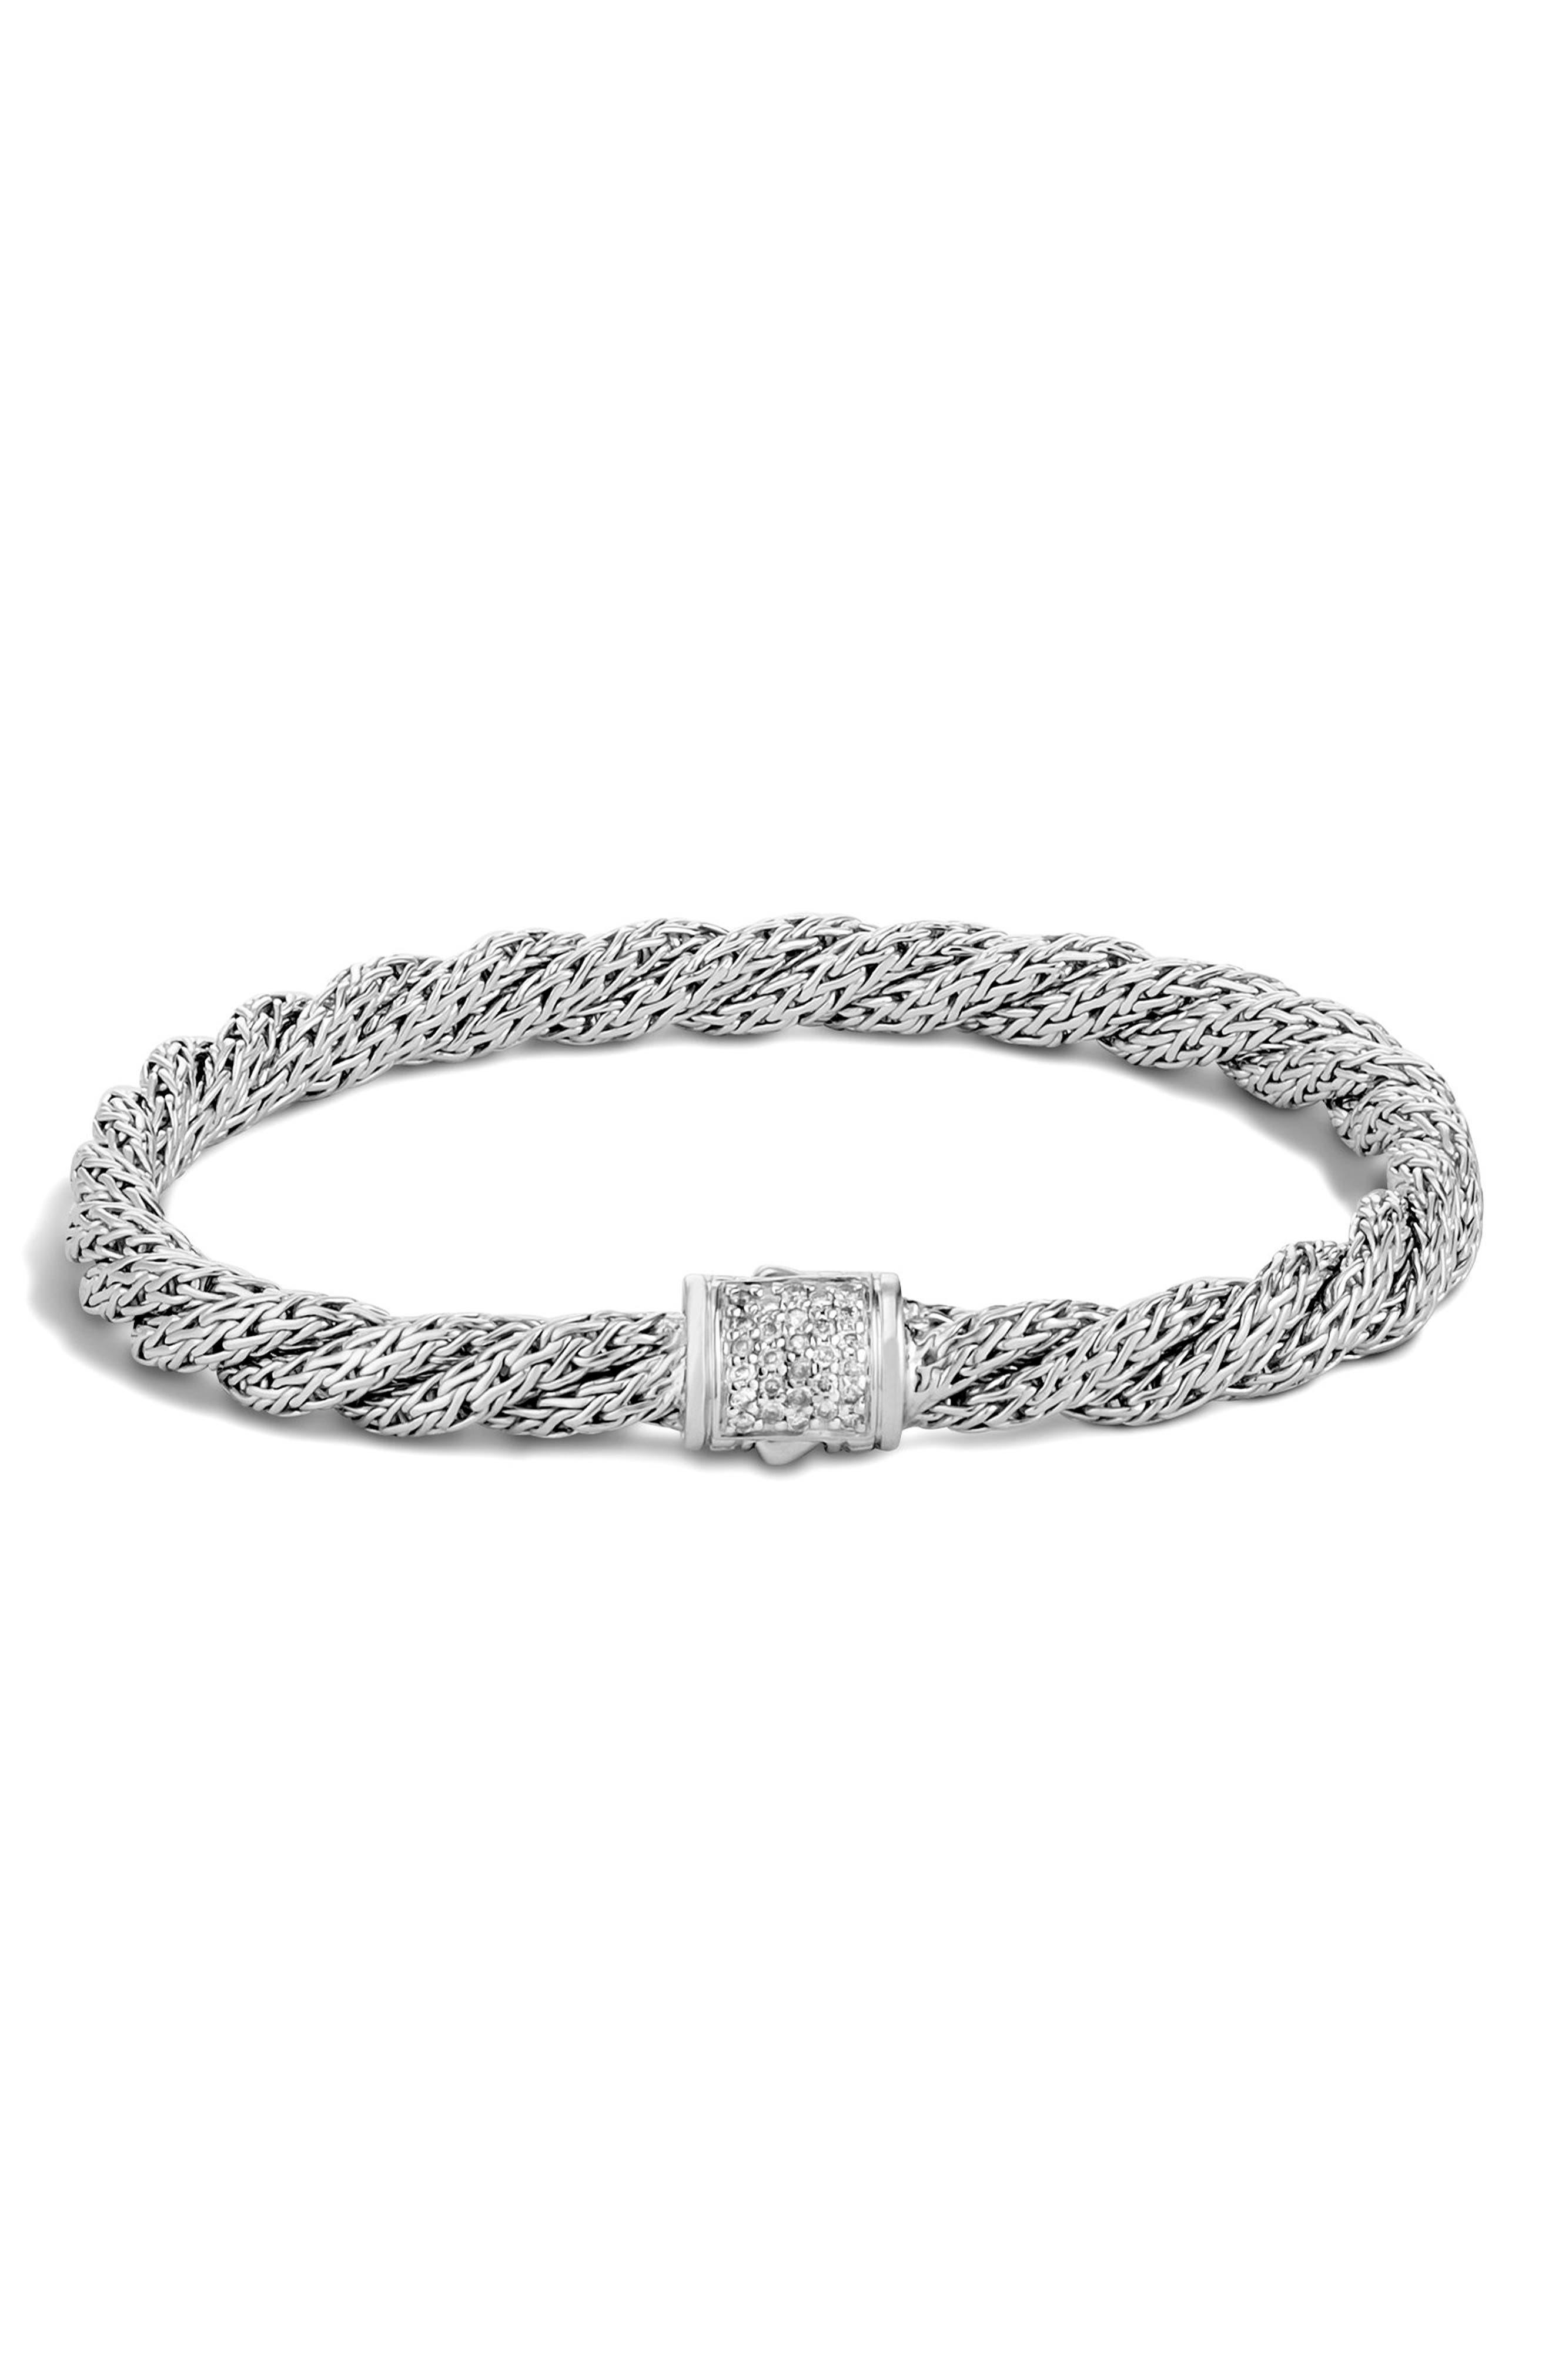 Twist Chain 5mm Bracelet with Diamonds,                             Main thumbnail 1, color,                             SILVER/ DIAMOND